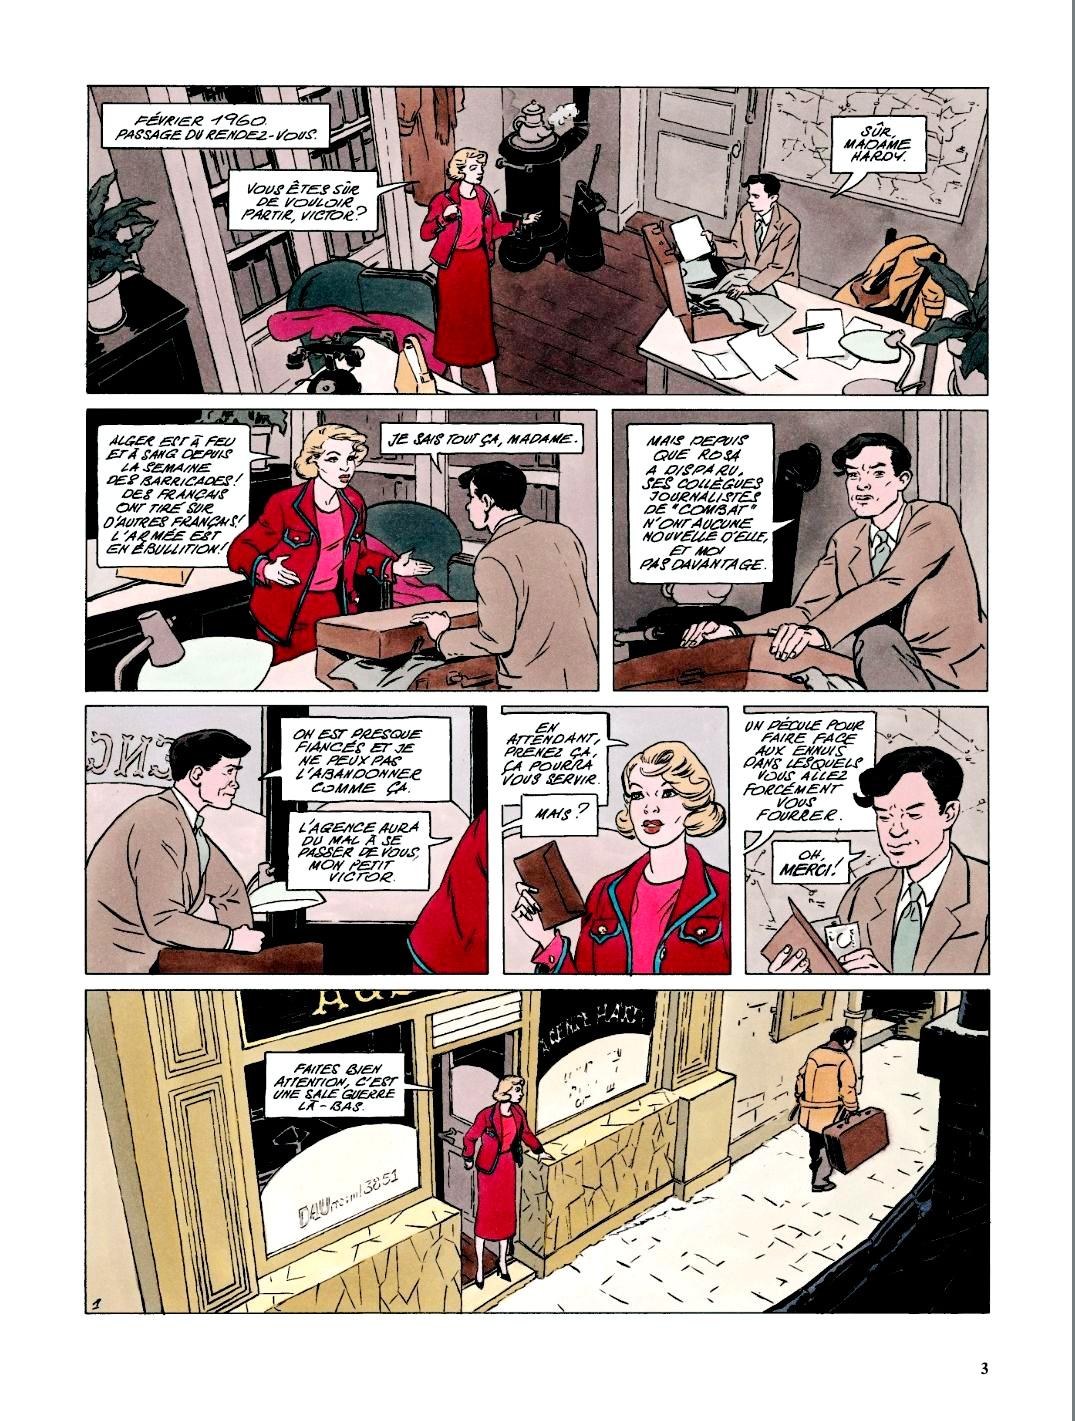 https://nine.mangadogs.com/fr_manga/pic1/41/2409/78946/BandeDessineAgenceHardyAge_1_442.jpg Page 2